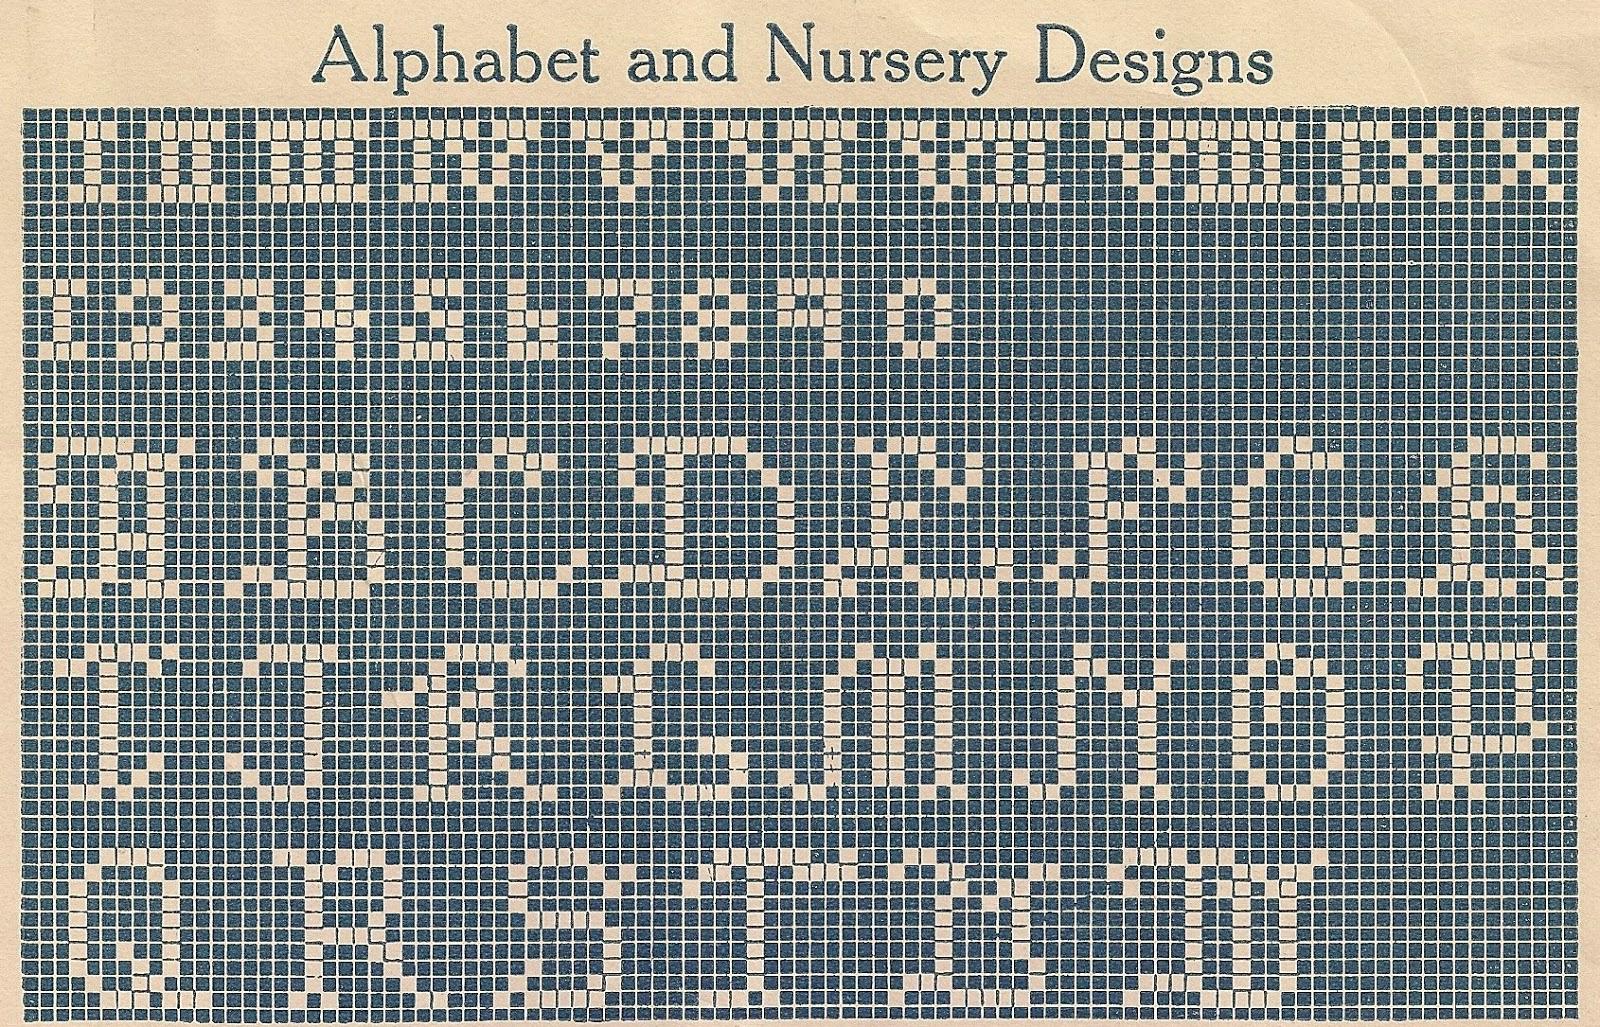 Sentimental Baby: Children\'s Motifs for Cross Stitch or Filet Crochet